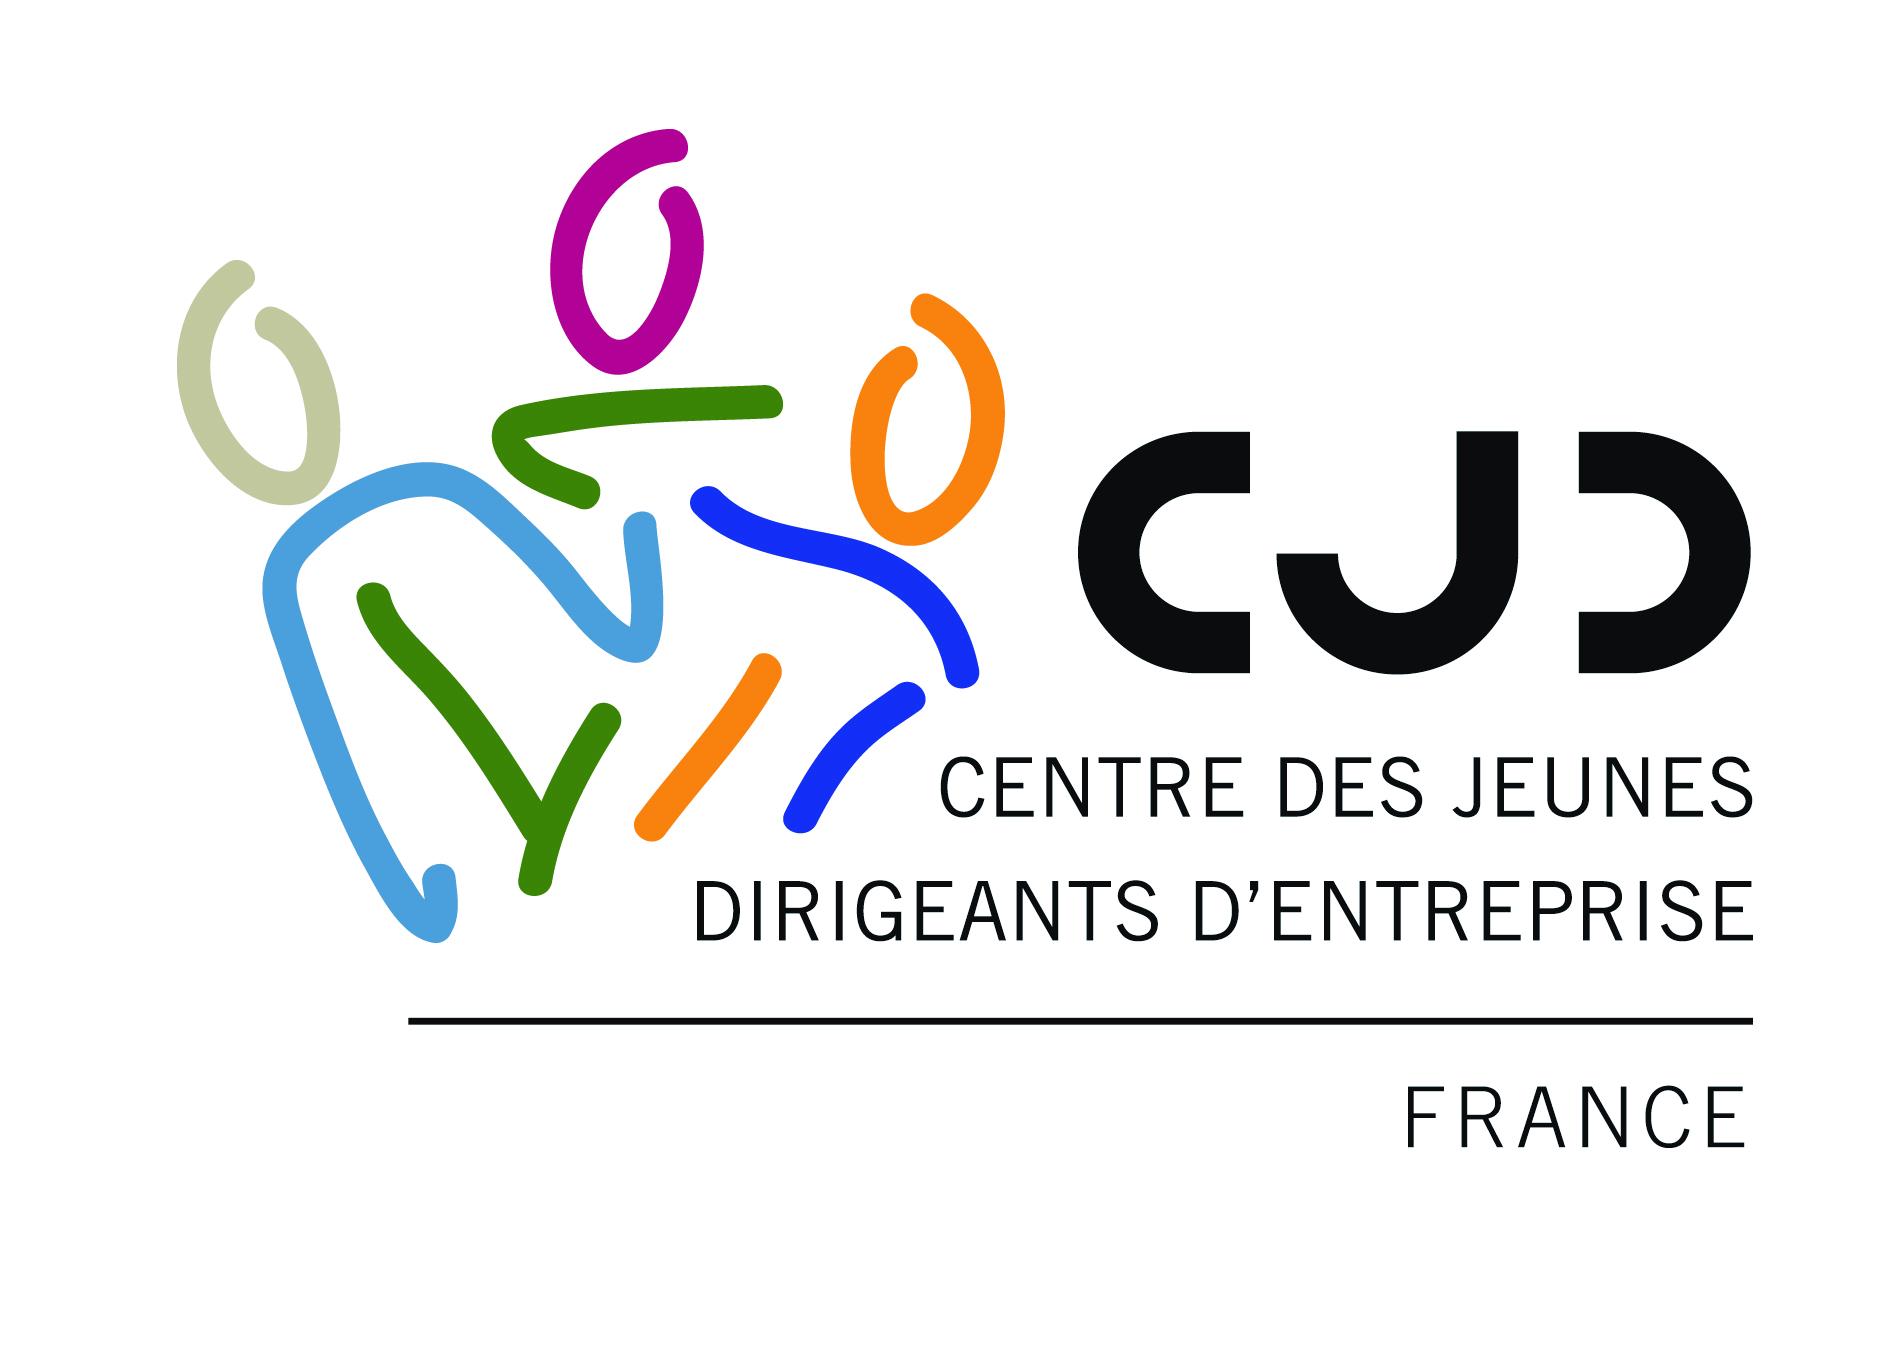 Logo CJD France 2012 CMJN 300